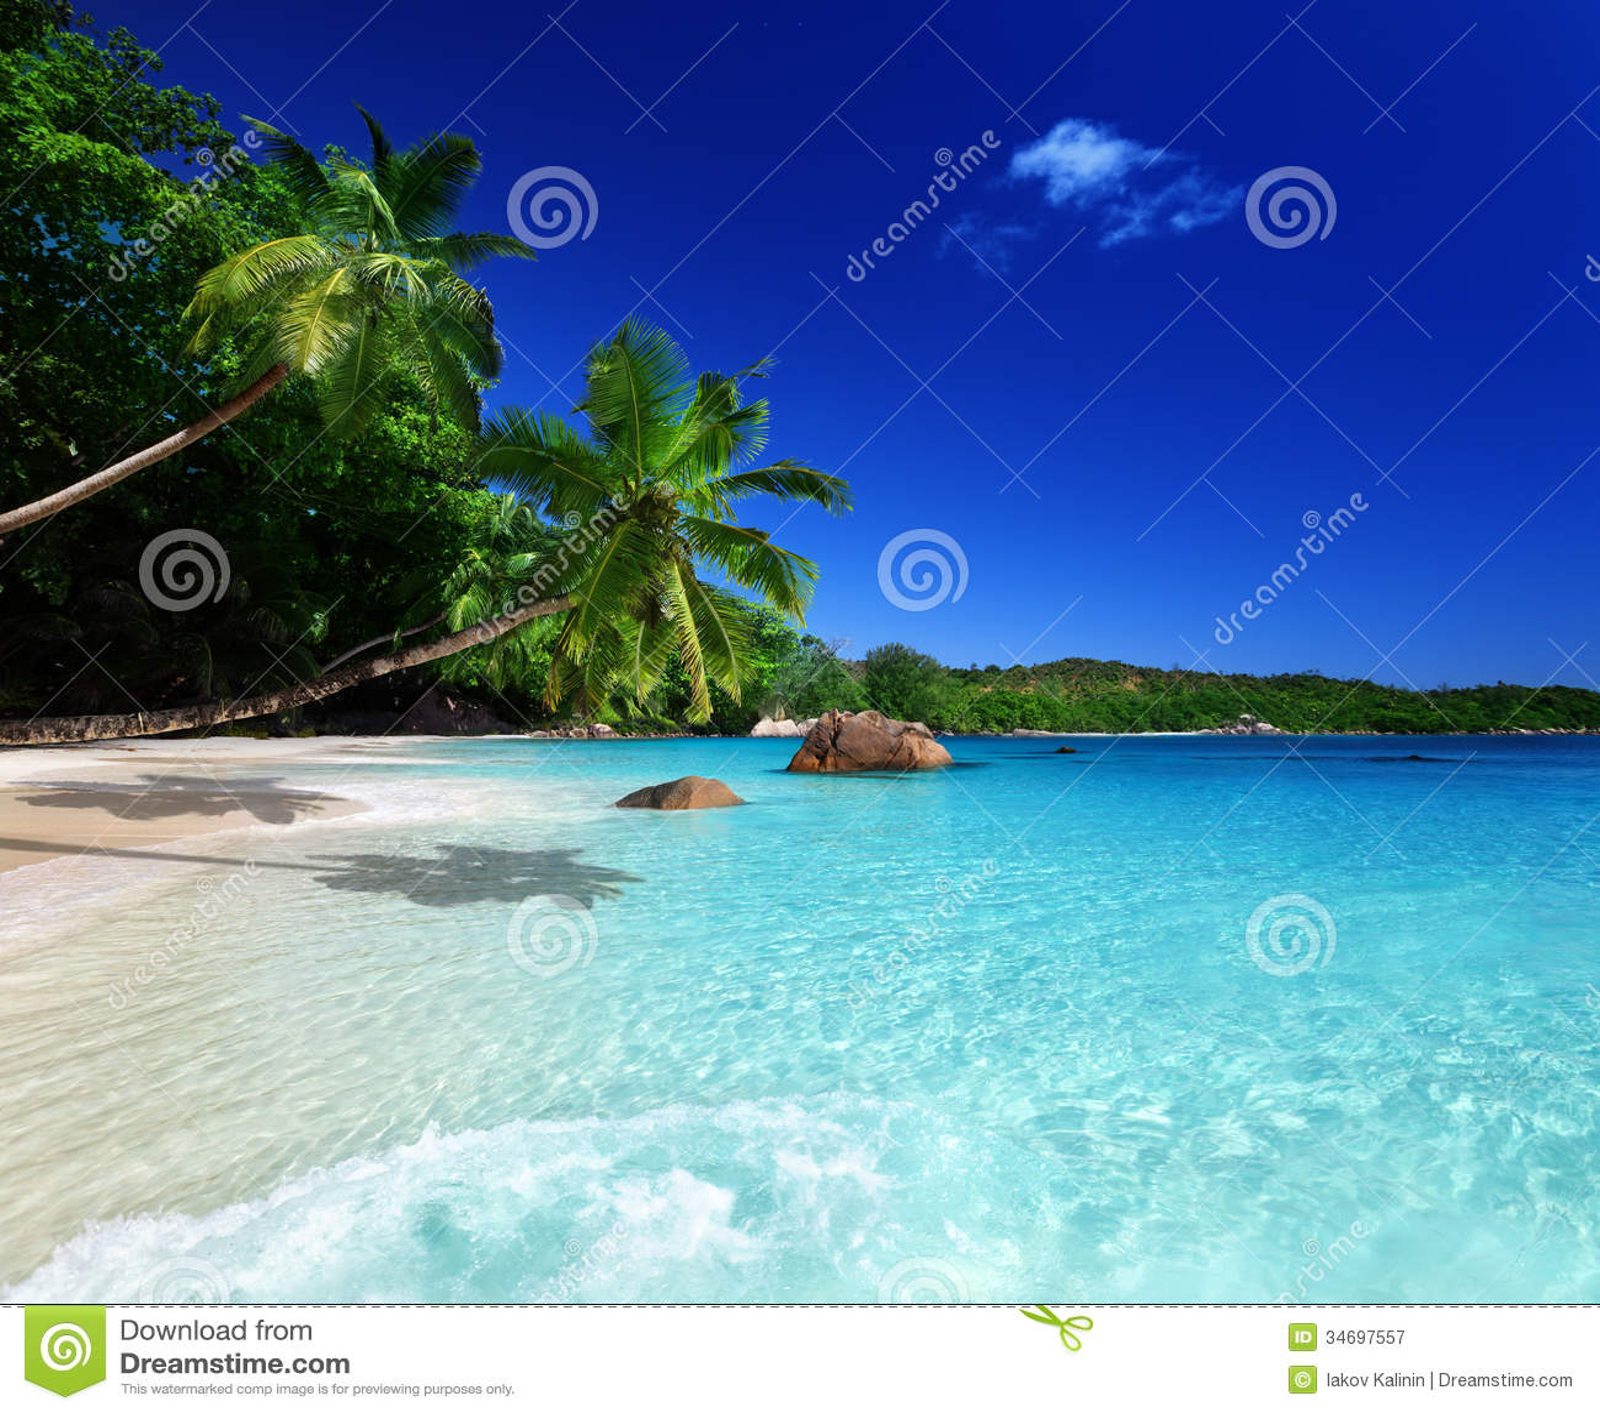 Seychelles Beach: Beach At Praslin Island Royalty Free Stock Photography